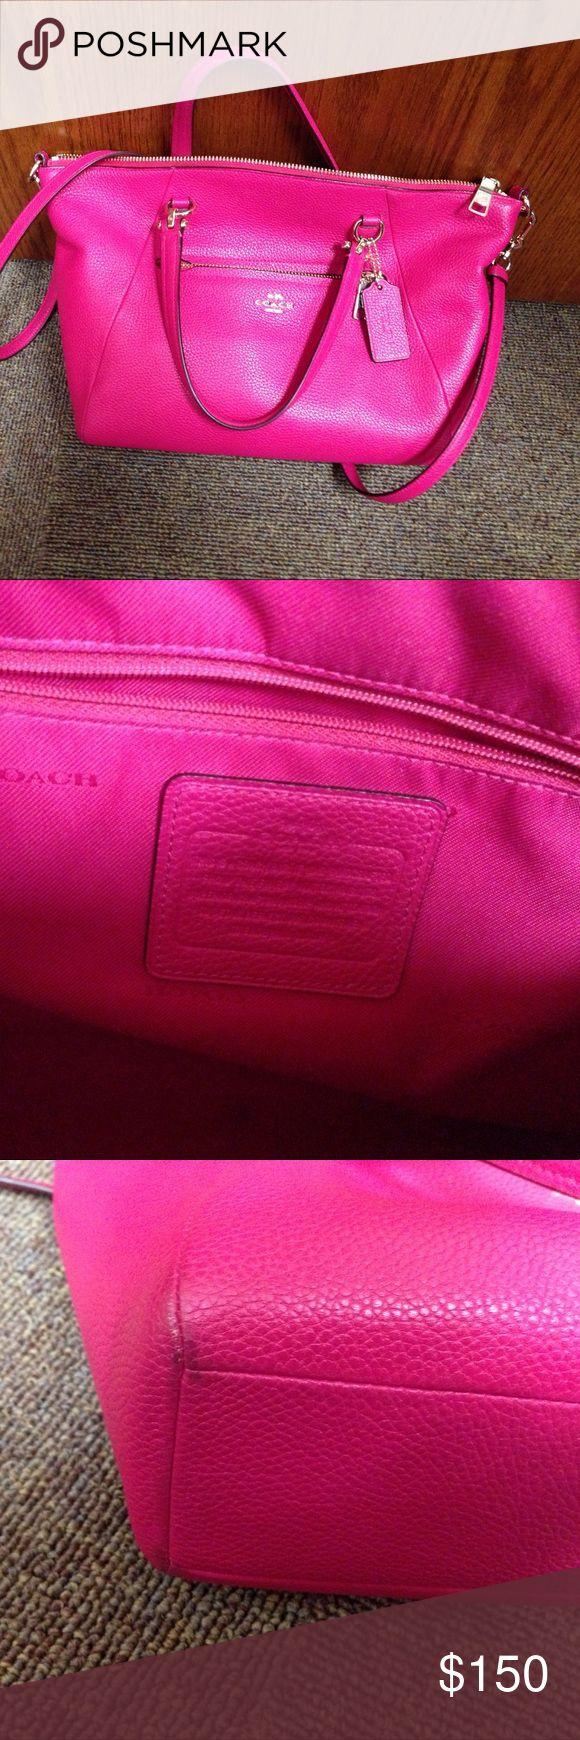 Coach Purse Bright pink Coach Bags Shoulder Bags